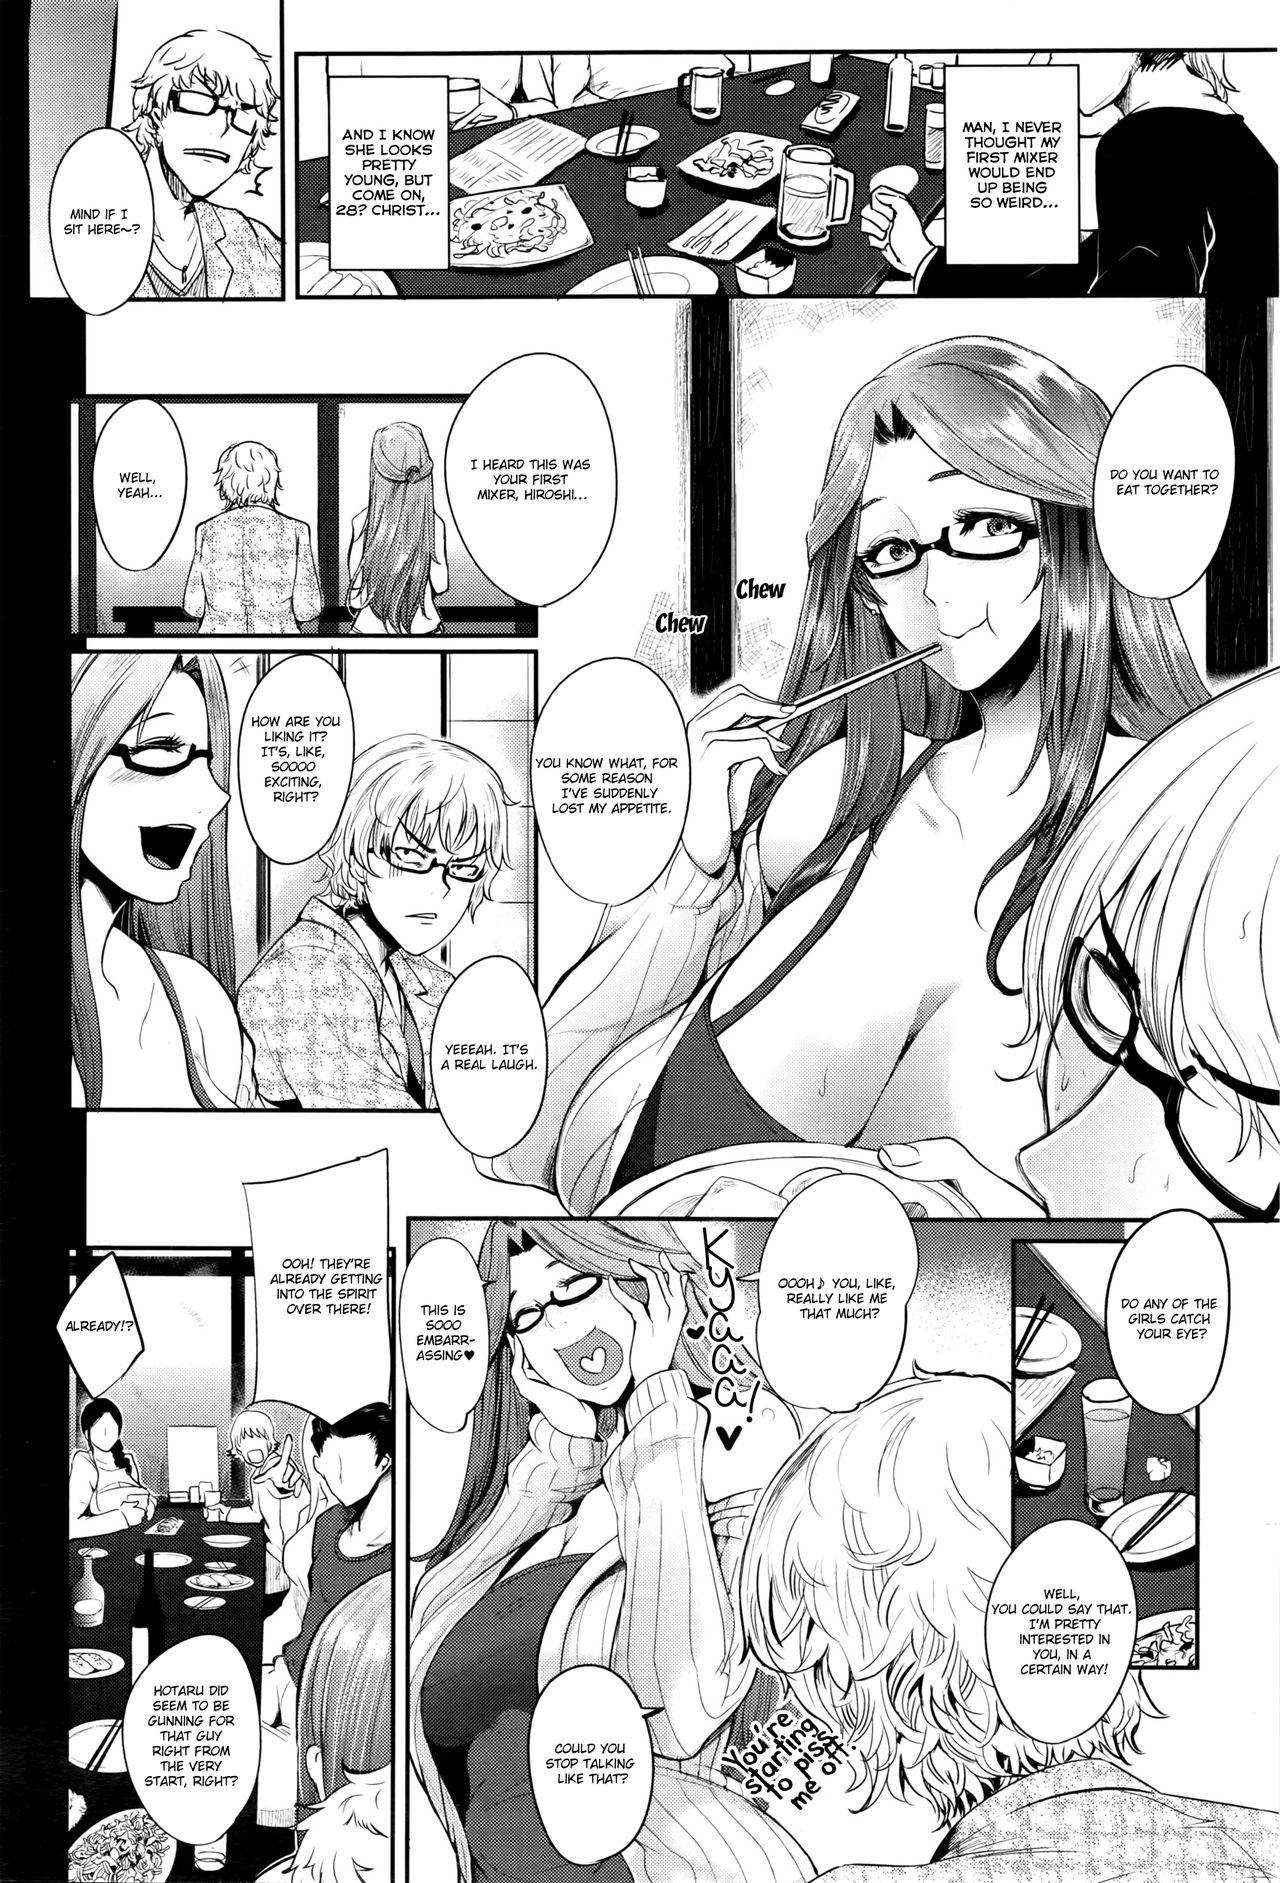 Hatsu Goukon wa Mama Naranai! | My First Mixer Was a Real Motherfucker! 3